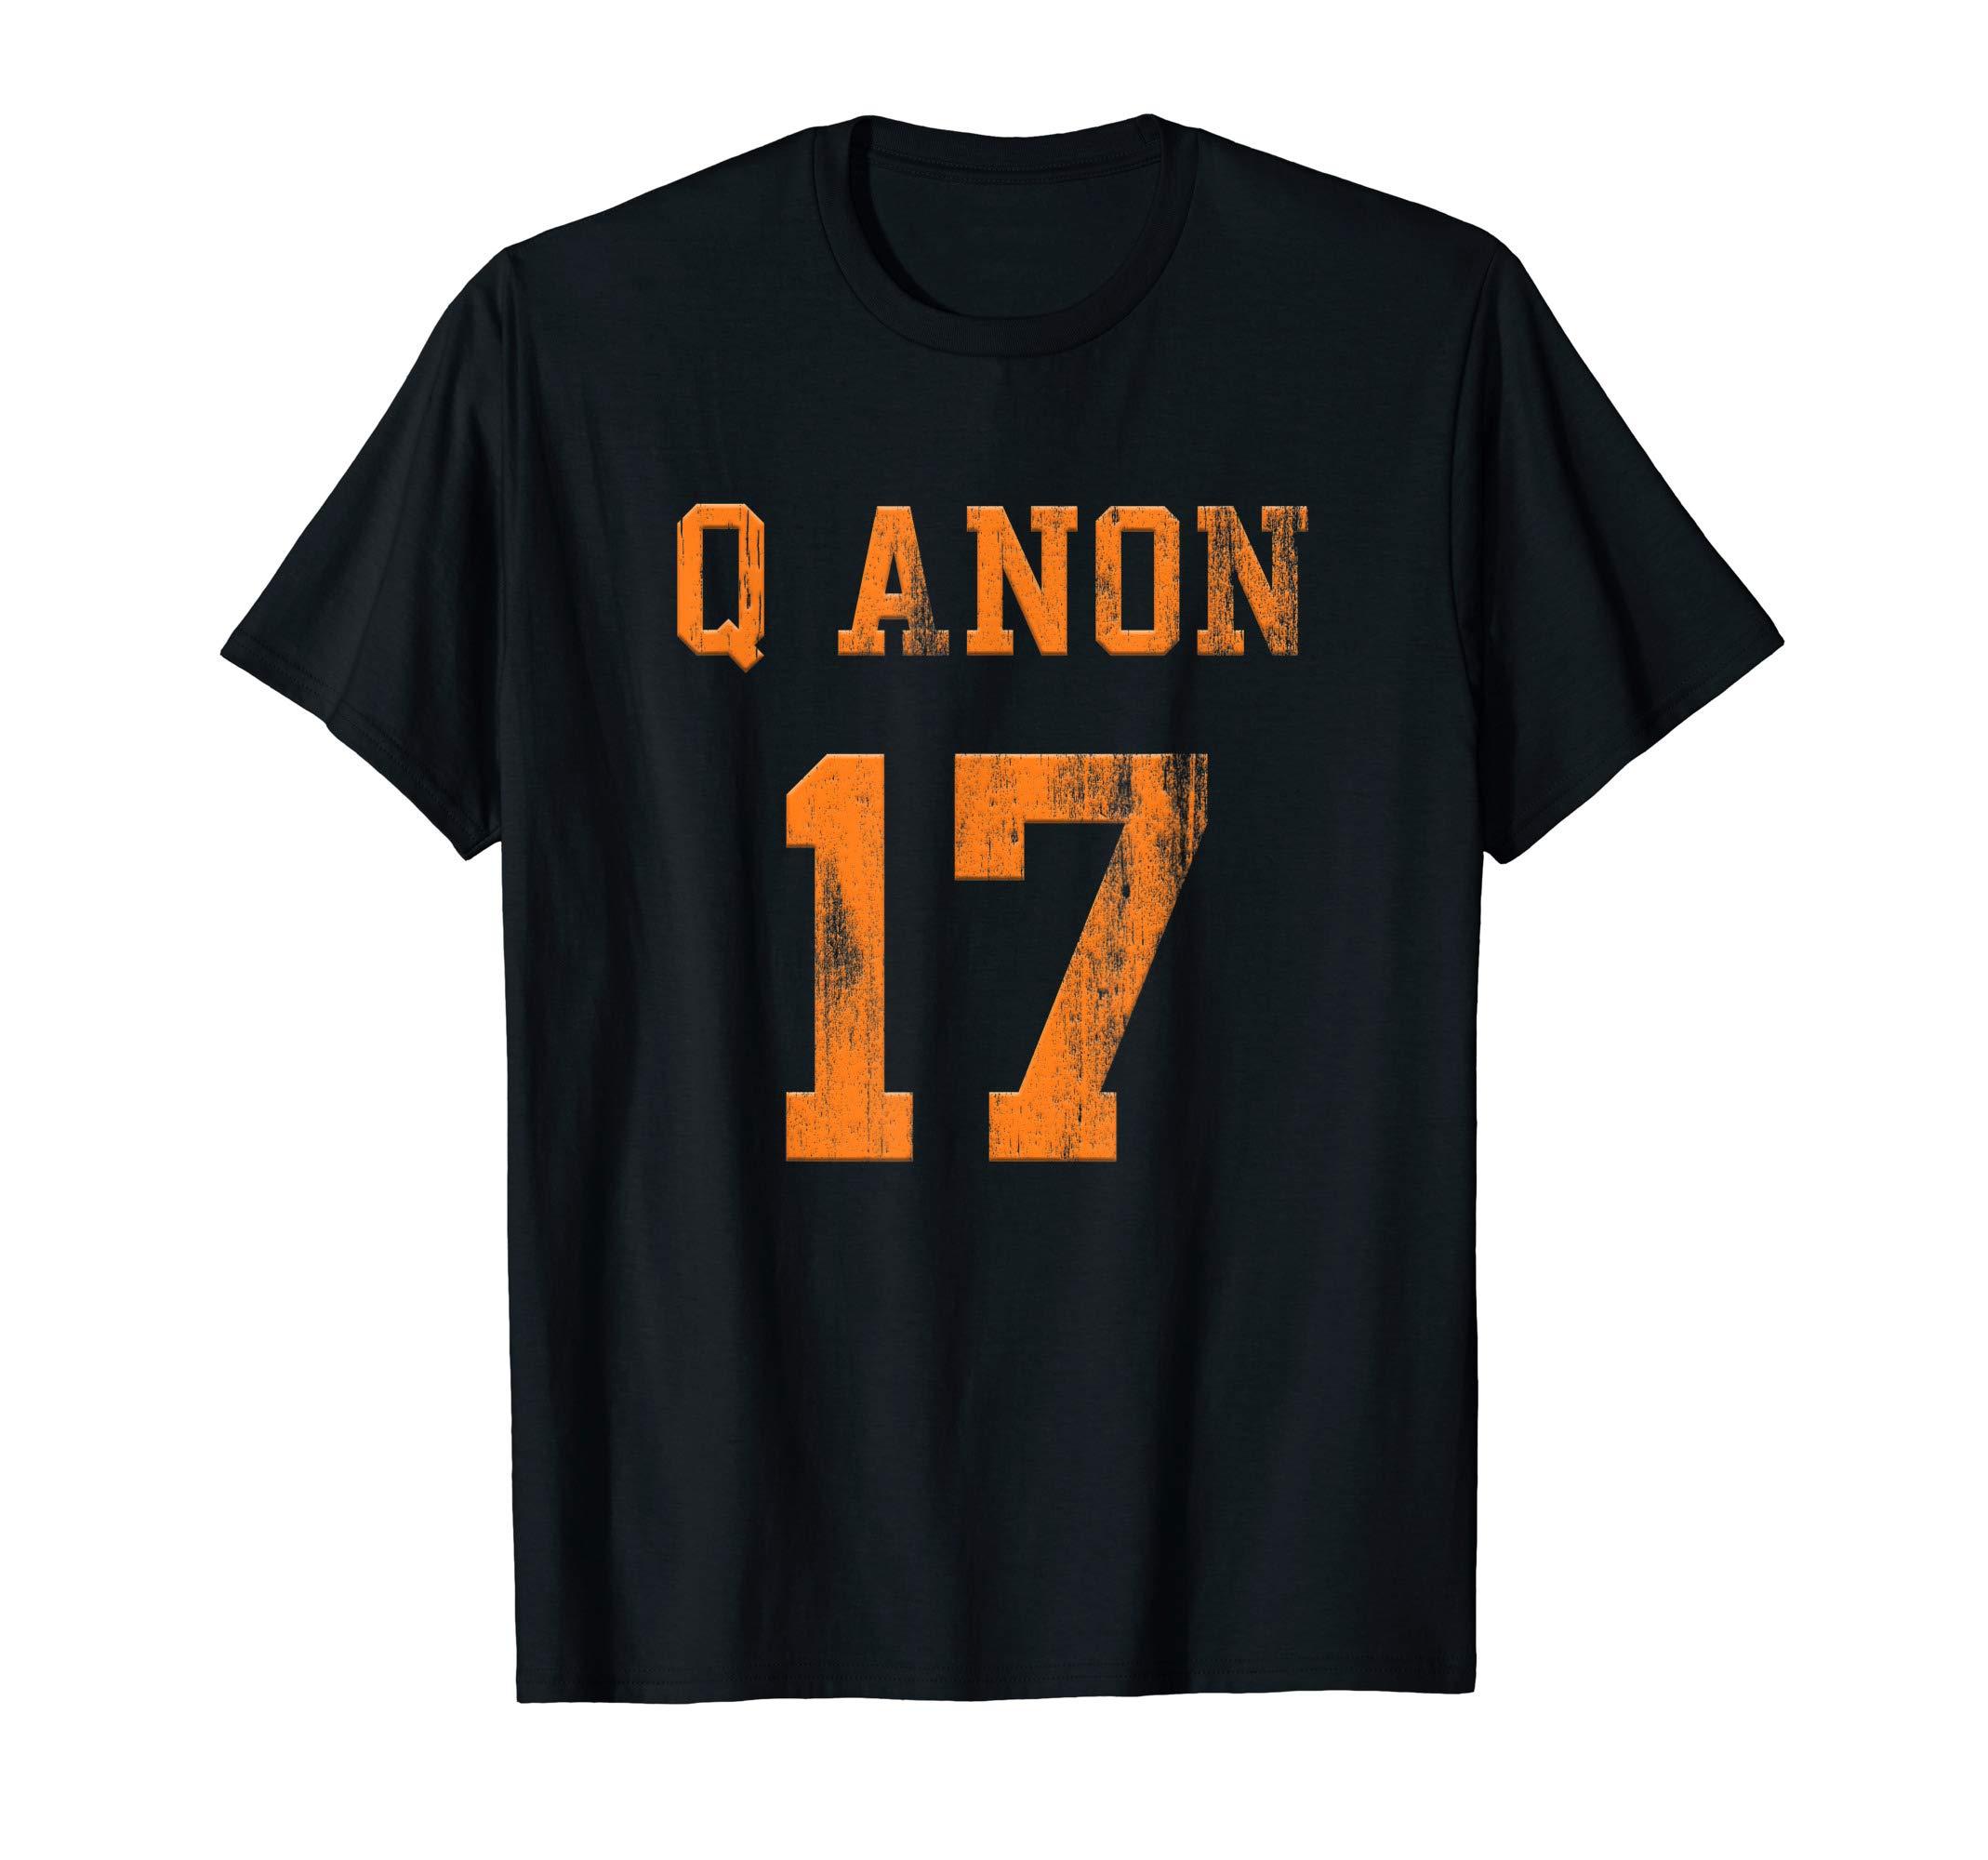 QAnon T Shirt Jersey Style 17 Q Anon Shirt For Q Patriot